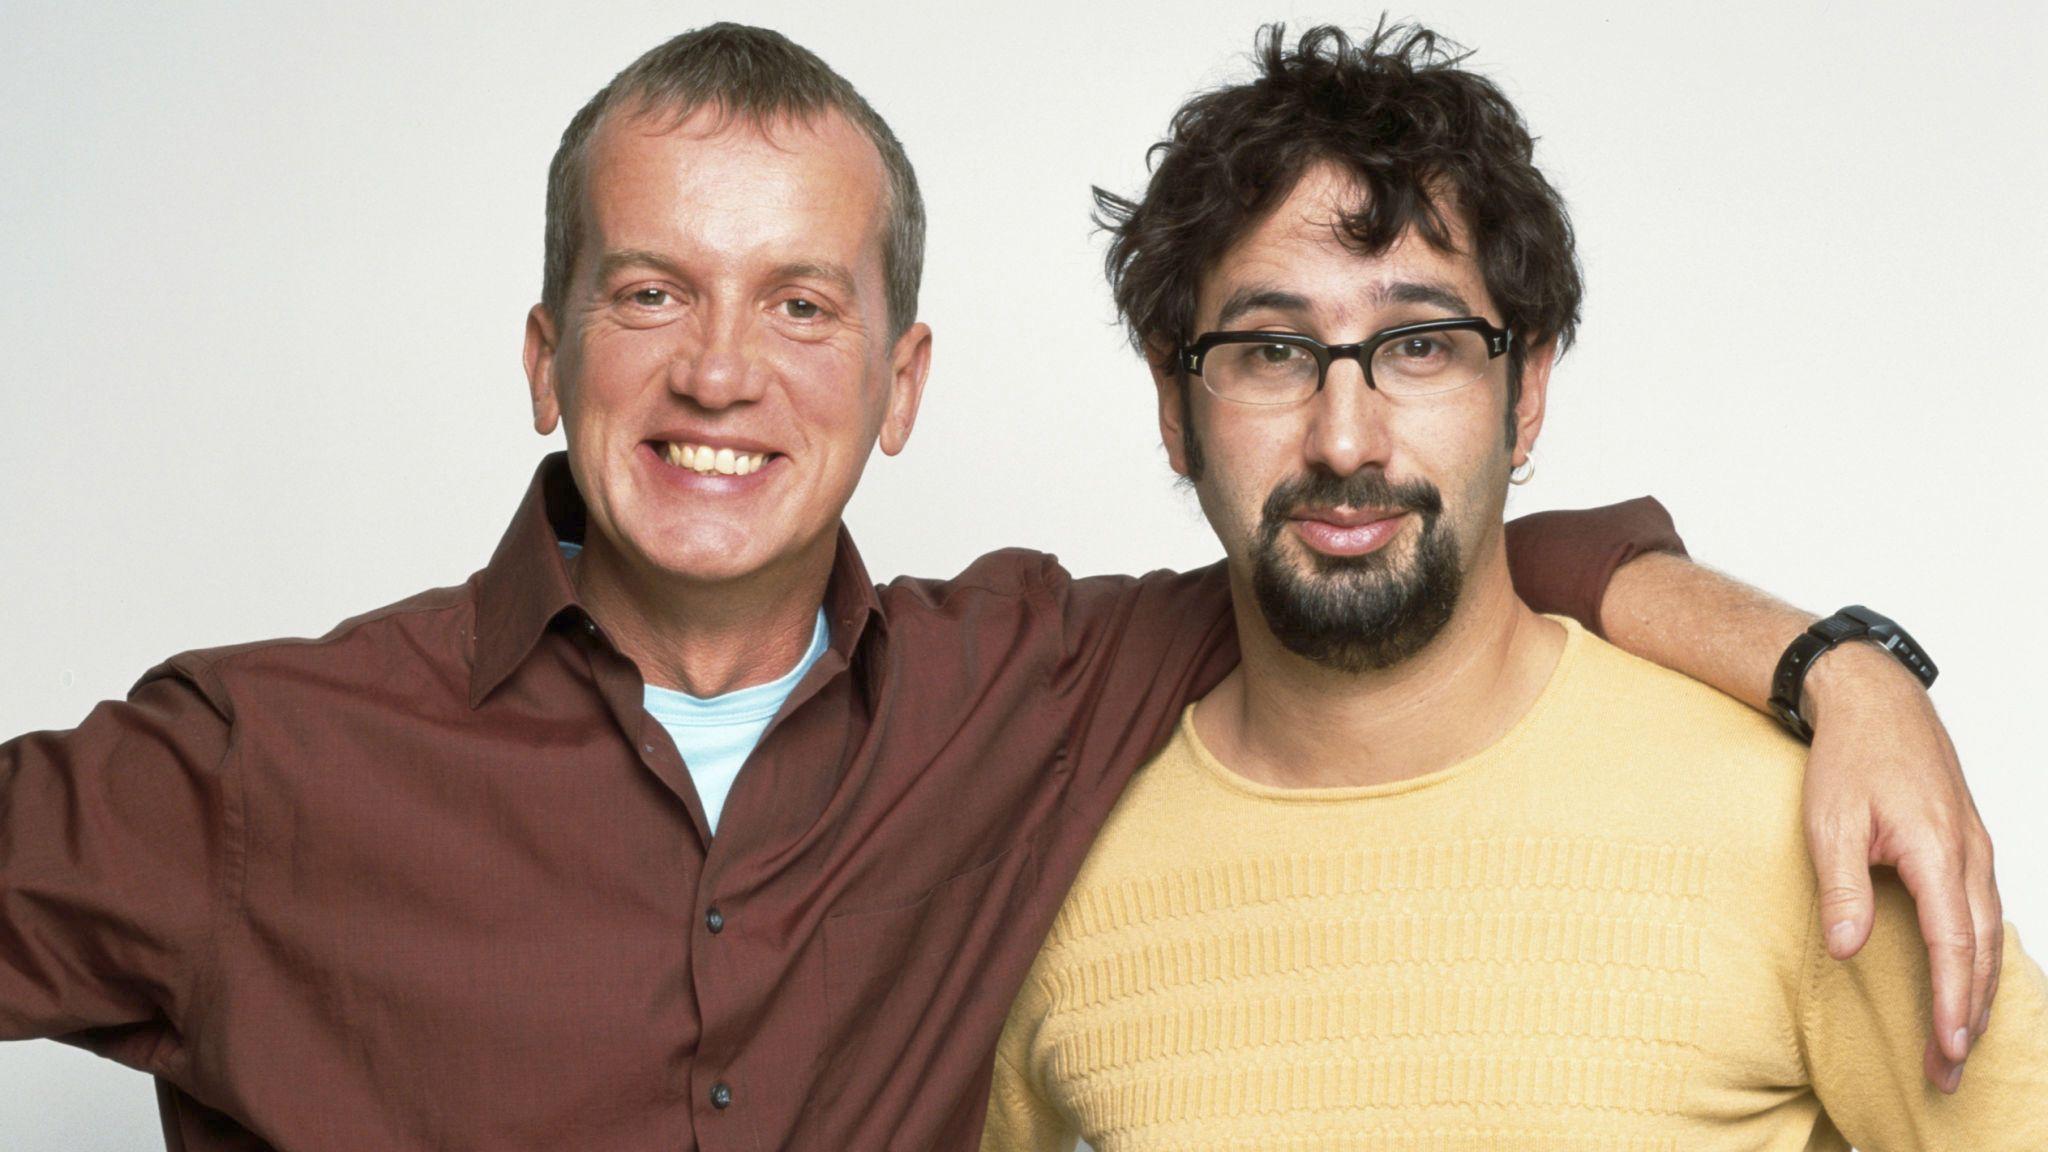 British comedians Frank Skinner and David Baddiel, circa 2000